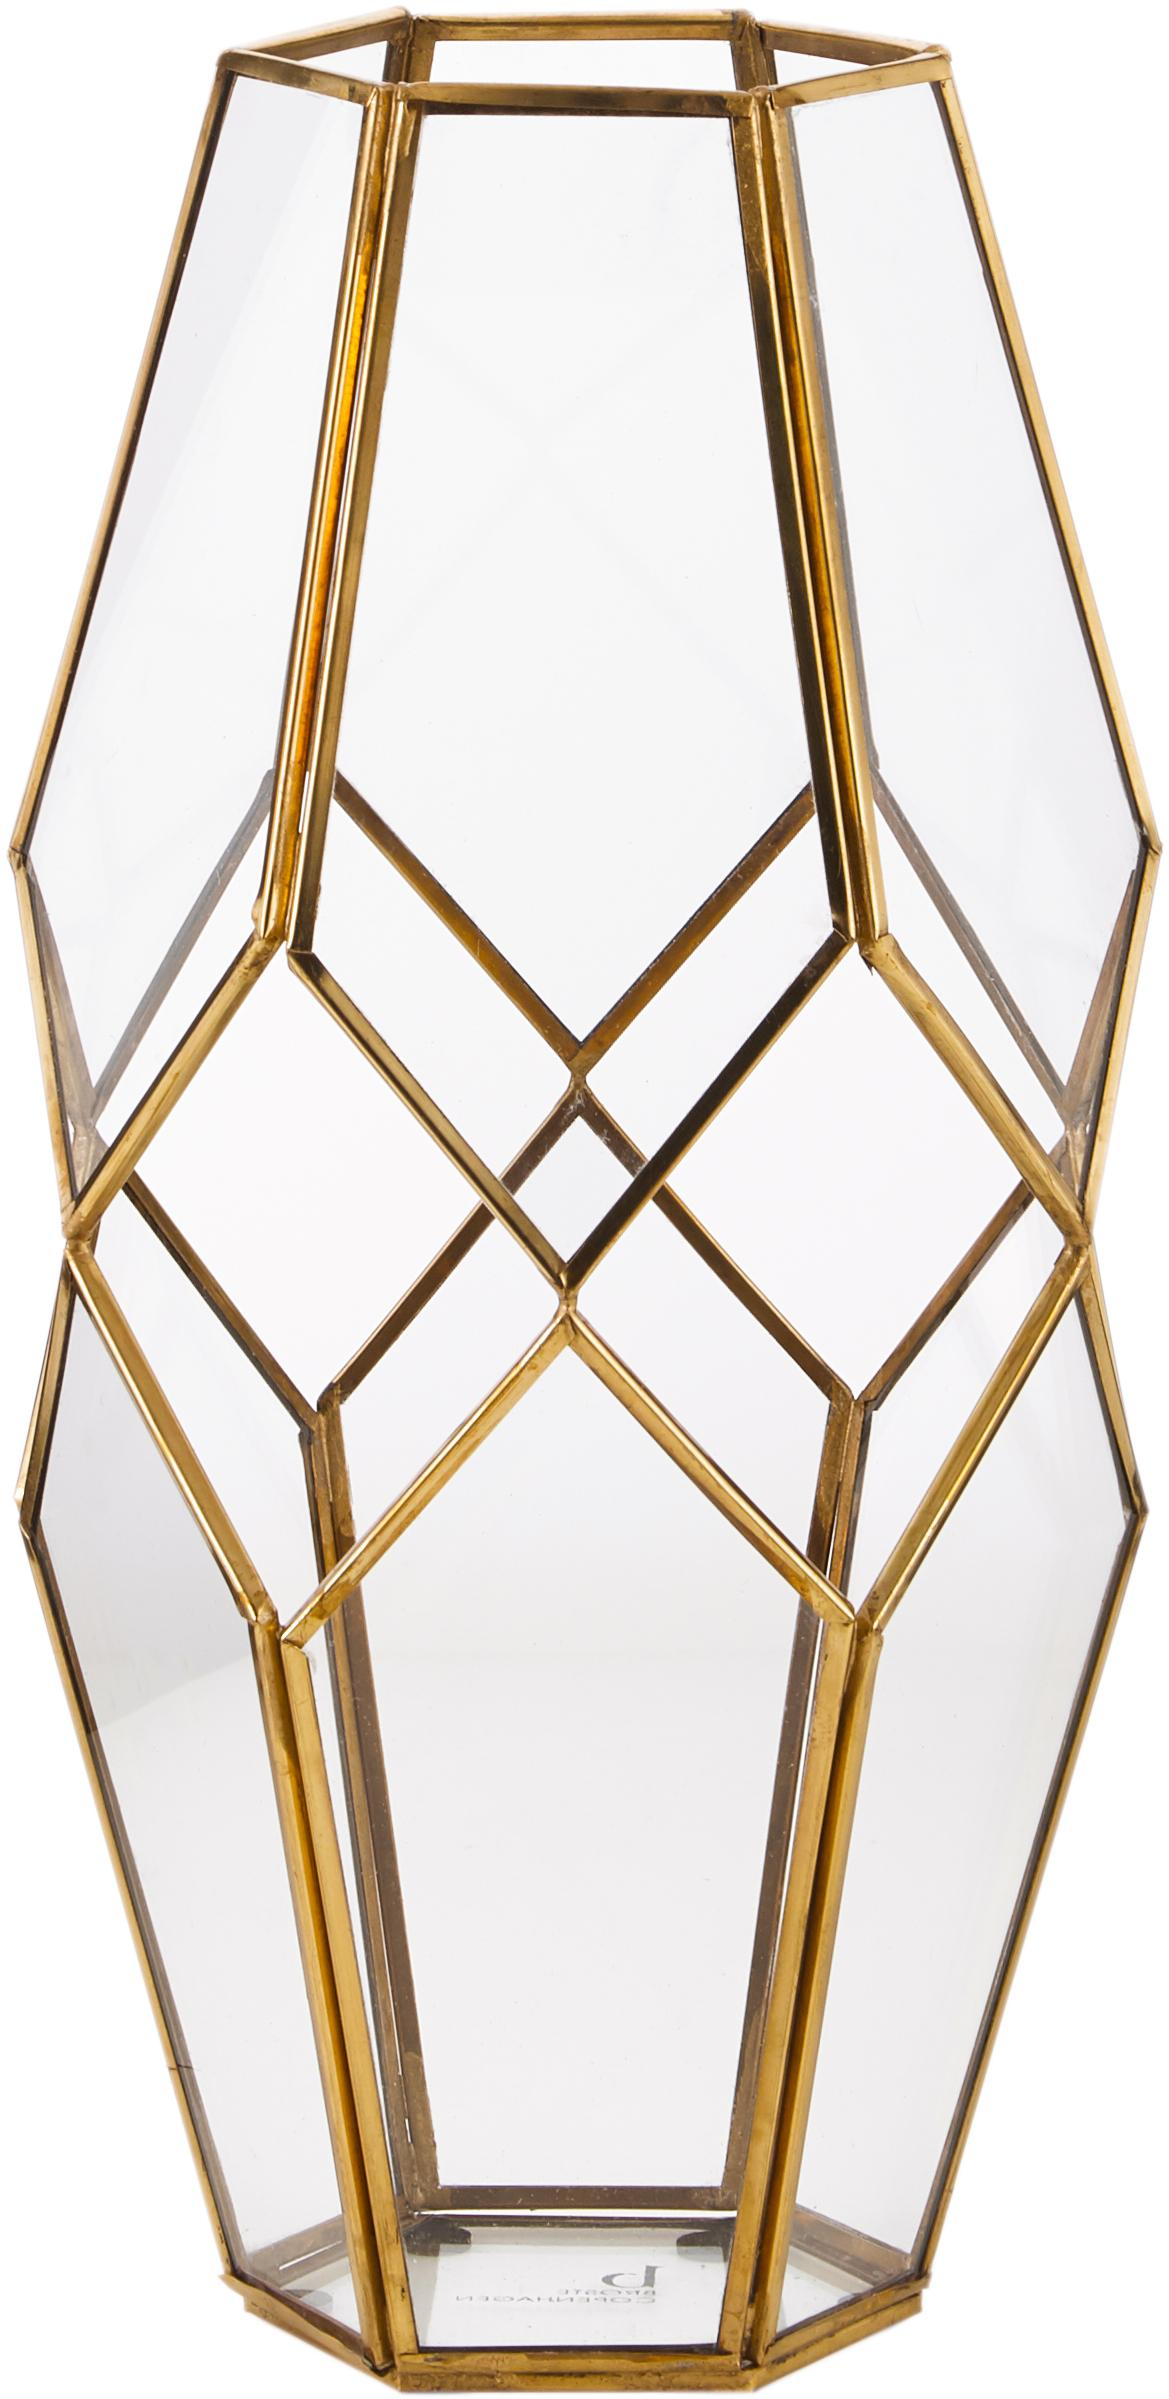 Portavelas Peter, Latón, vidrio, Transparente, latón, Al 33 cm